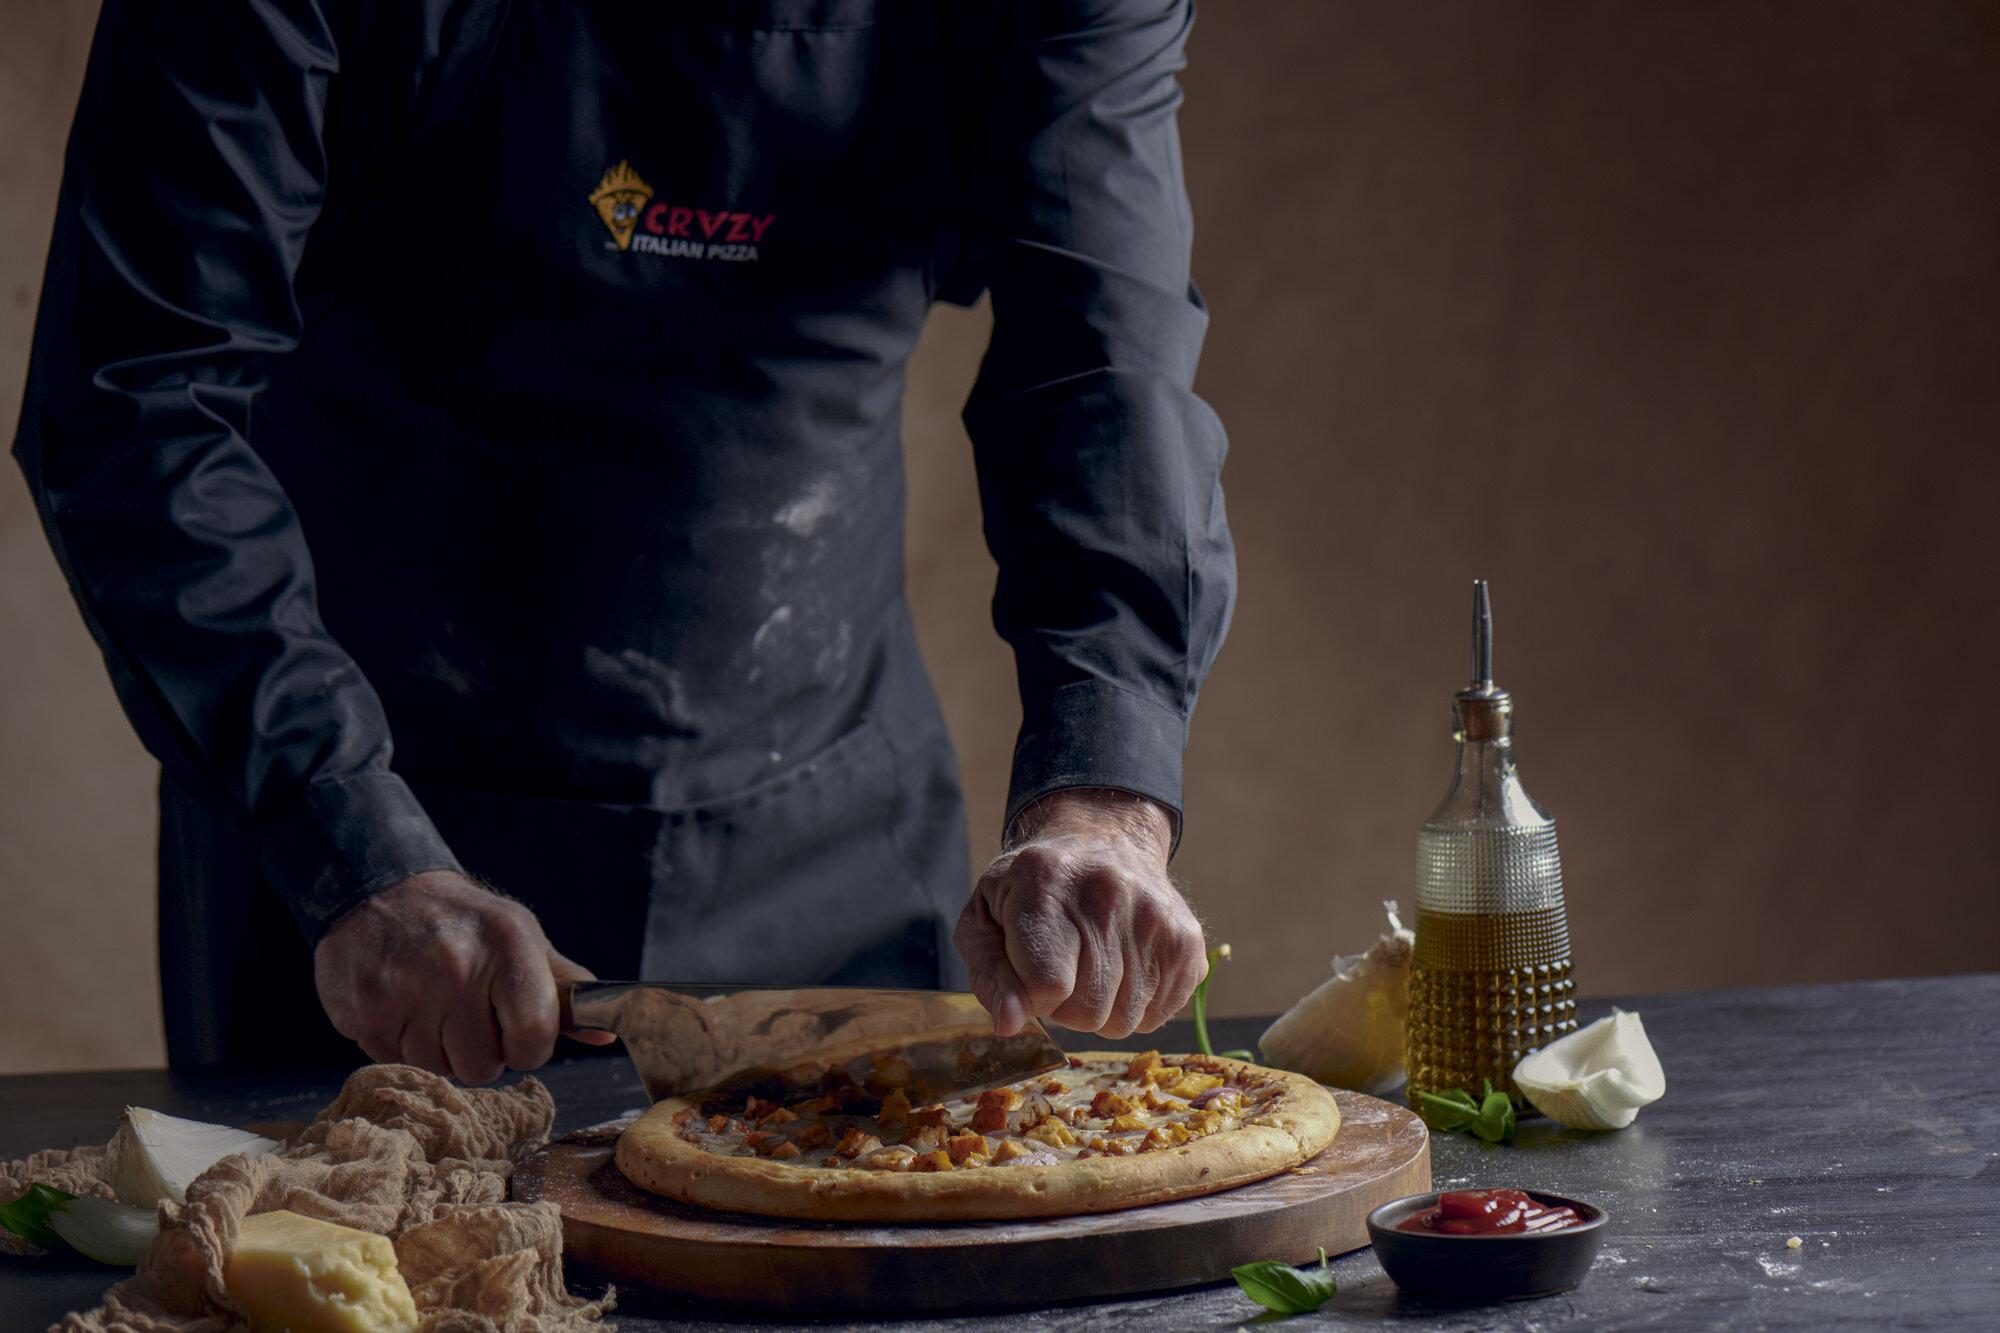 CIP_Pizza Lifestyle-5019-WebResolution.jpg